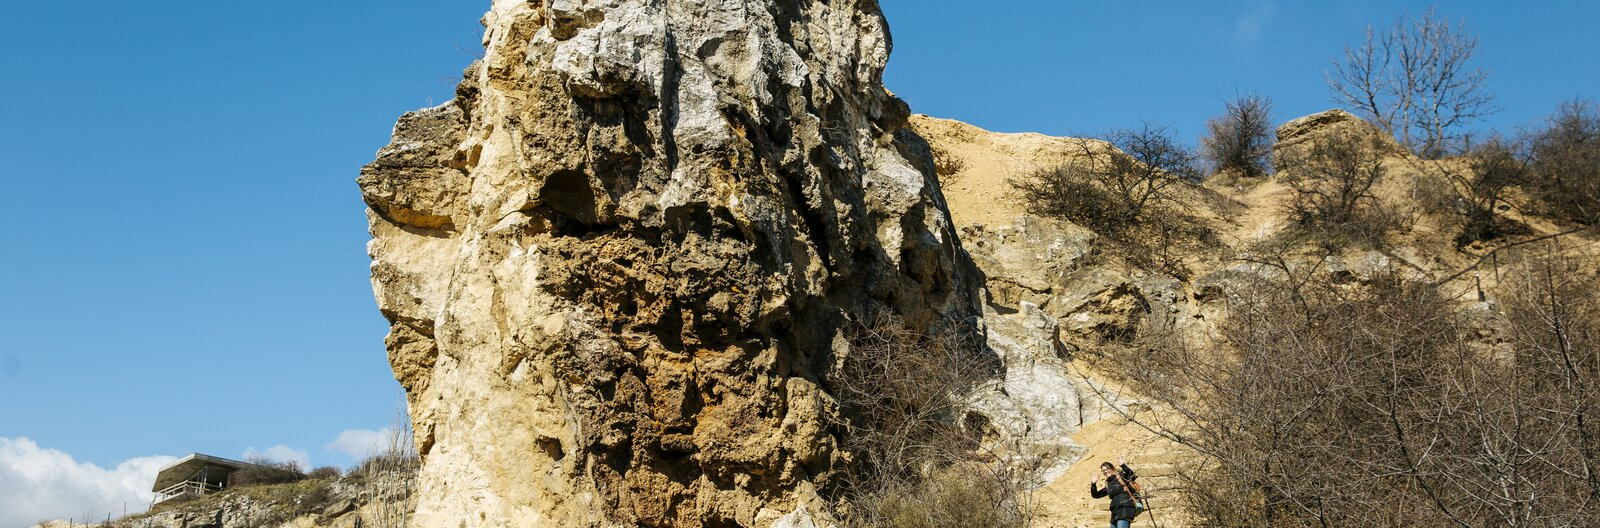 10 best hikes near Budapest